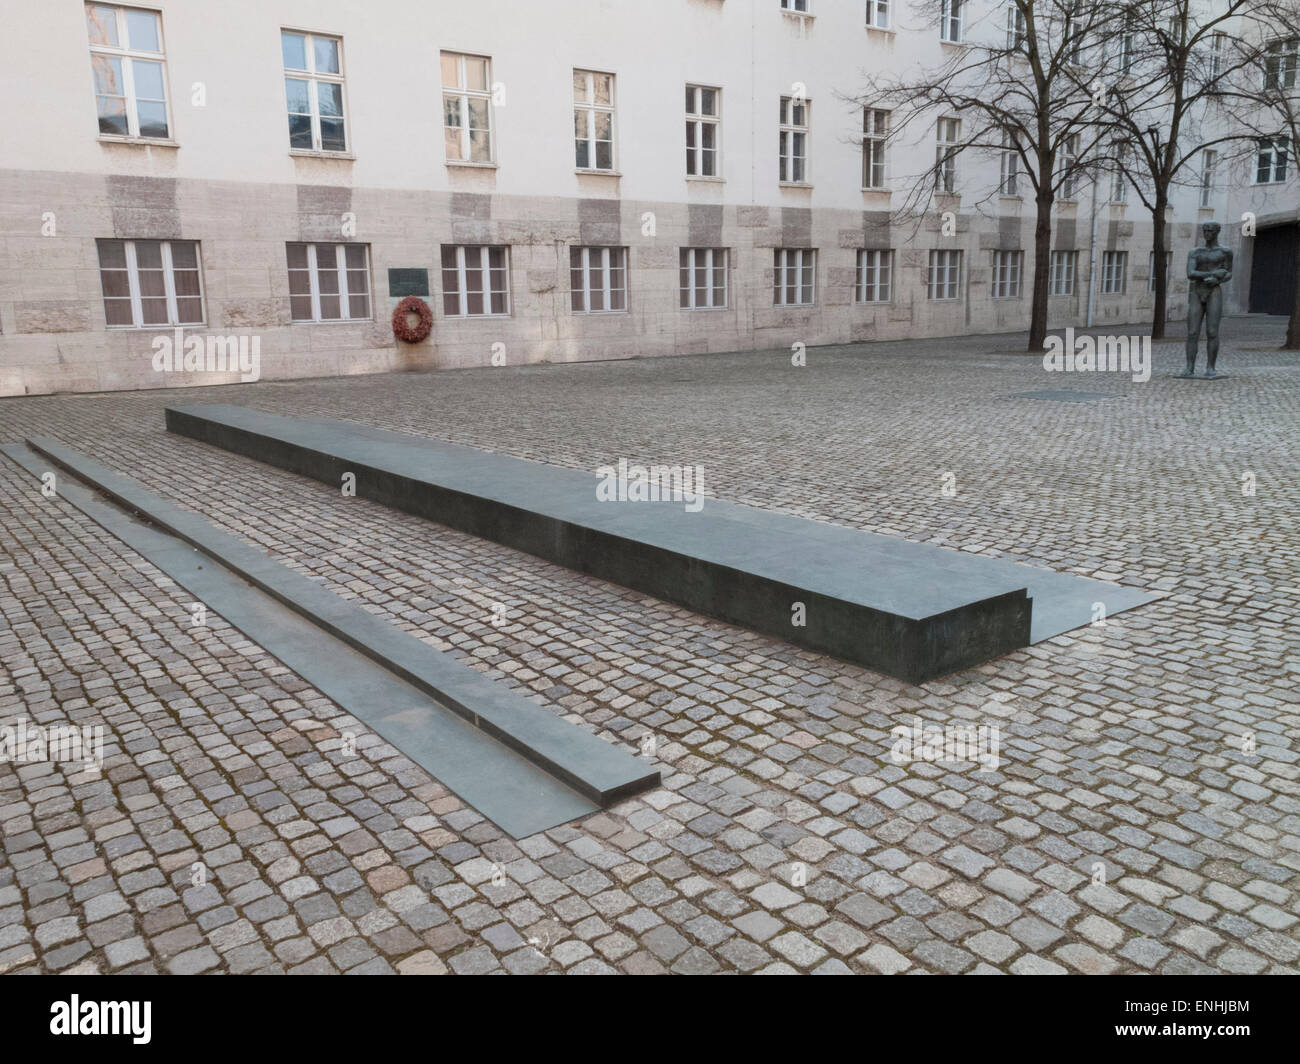 Claus von Stauffenberg monument Bendleblock Berlin Germany - Stock Image